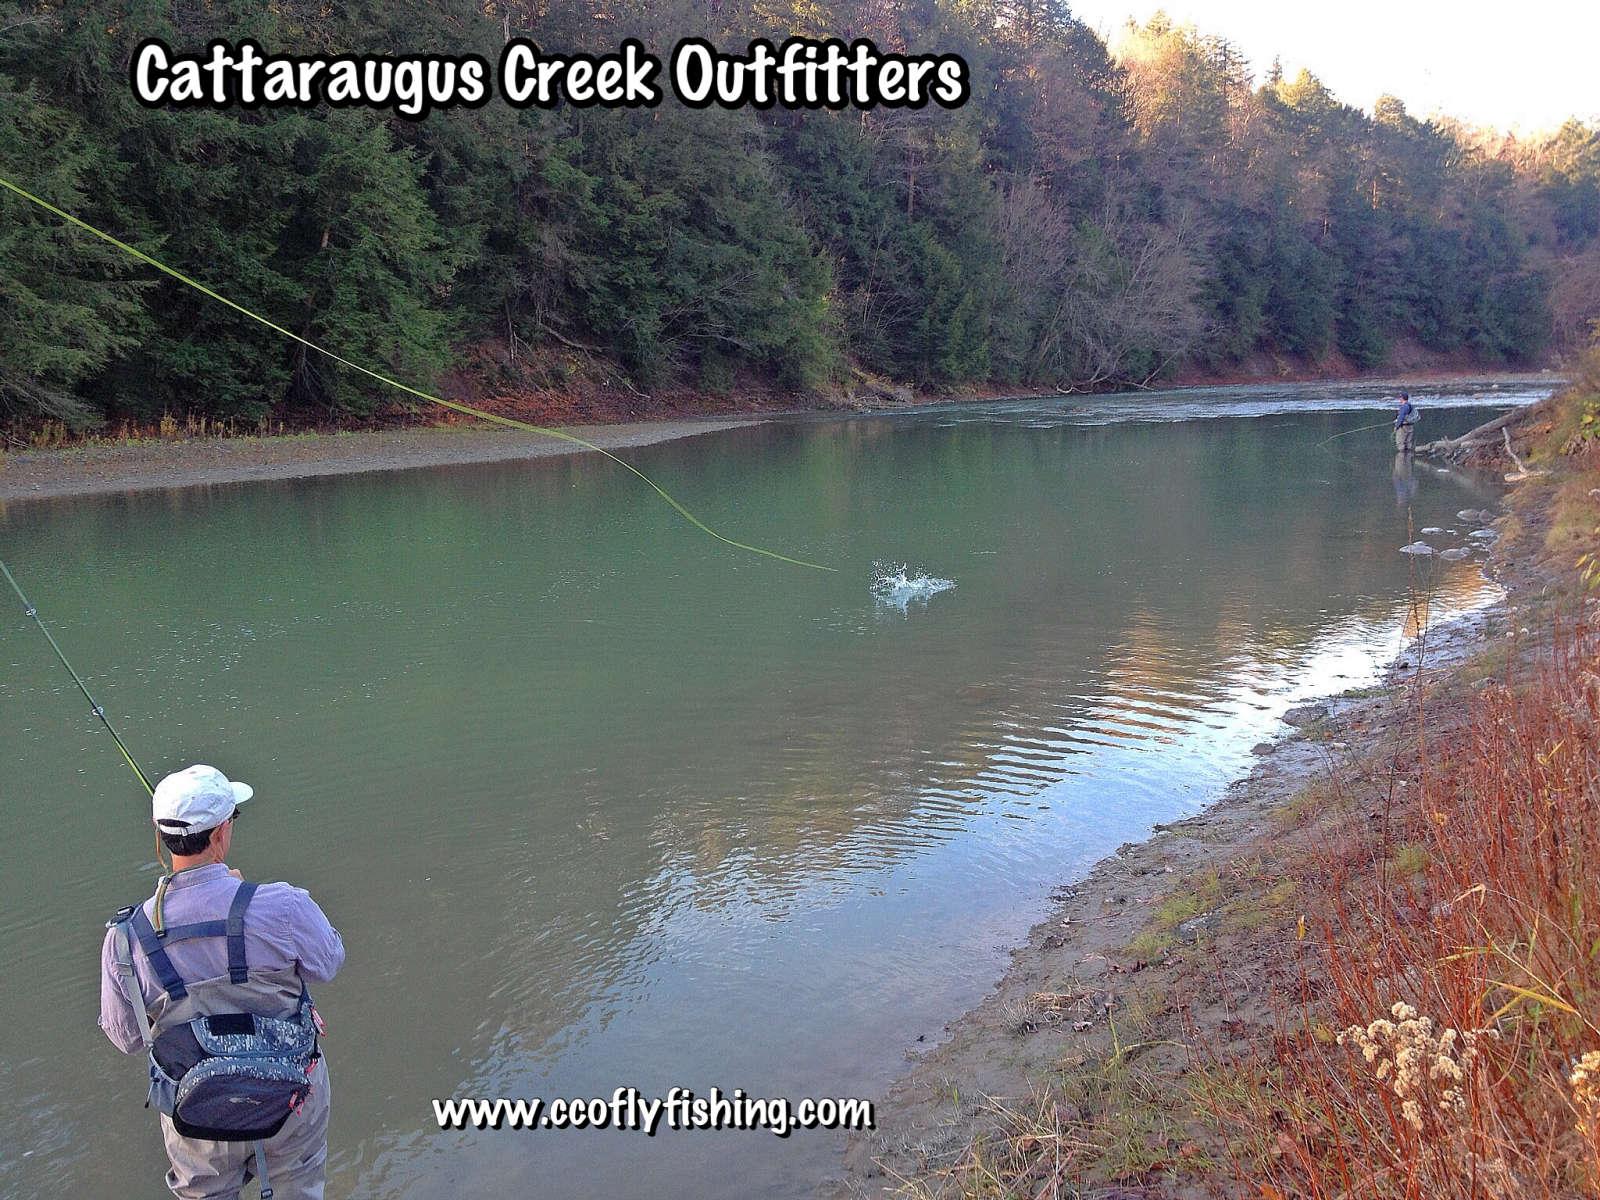 Zoar valley cattaraugus creek camping for Cattaraugus creek fishing report